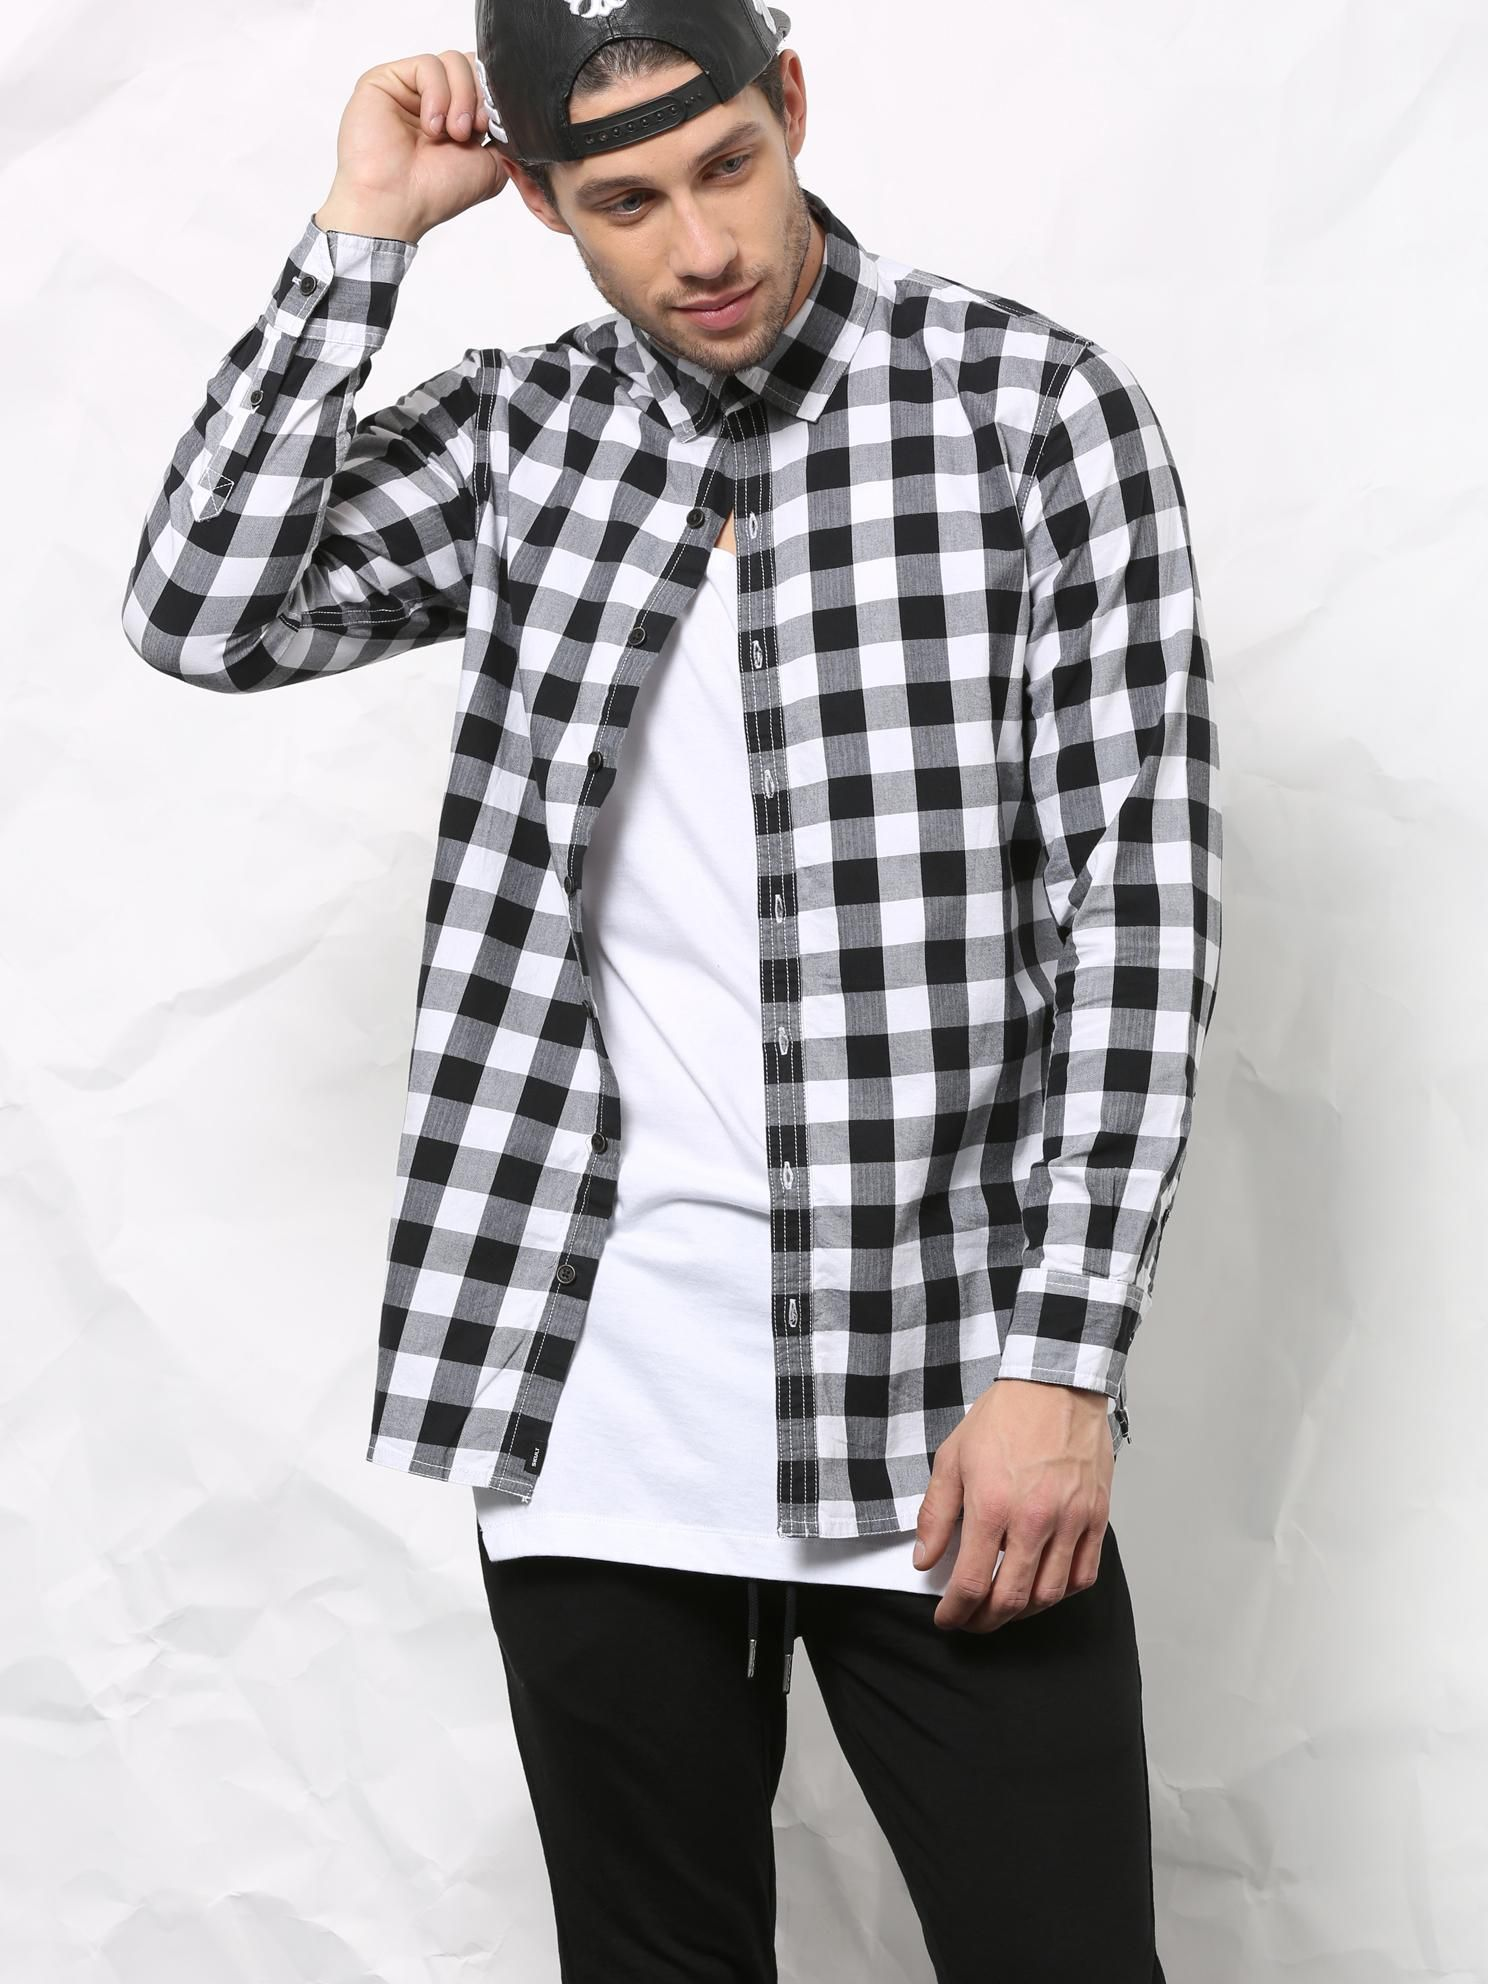 SKULT Black & White Longline Side Zipper Shirt | Stylish Shirts ...